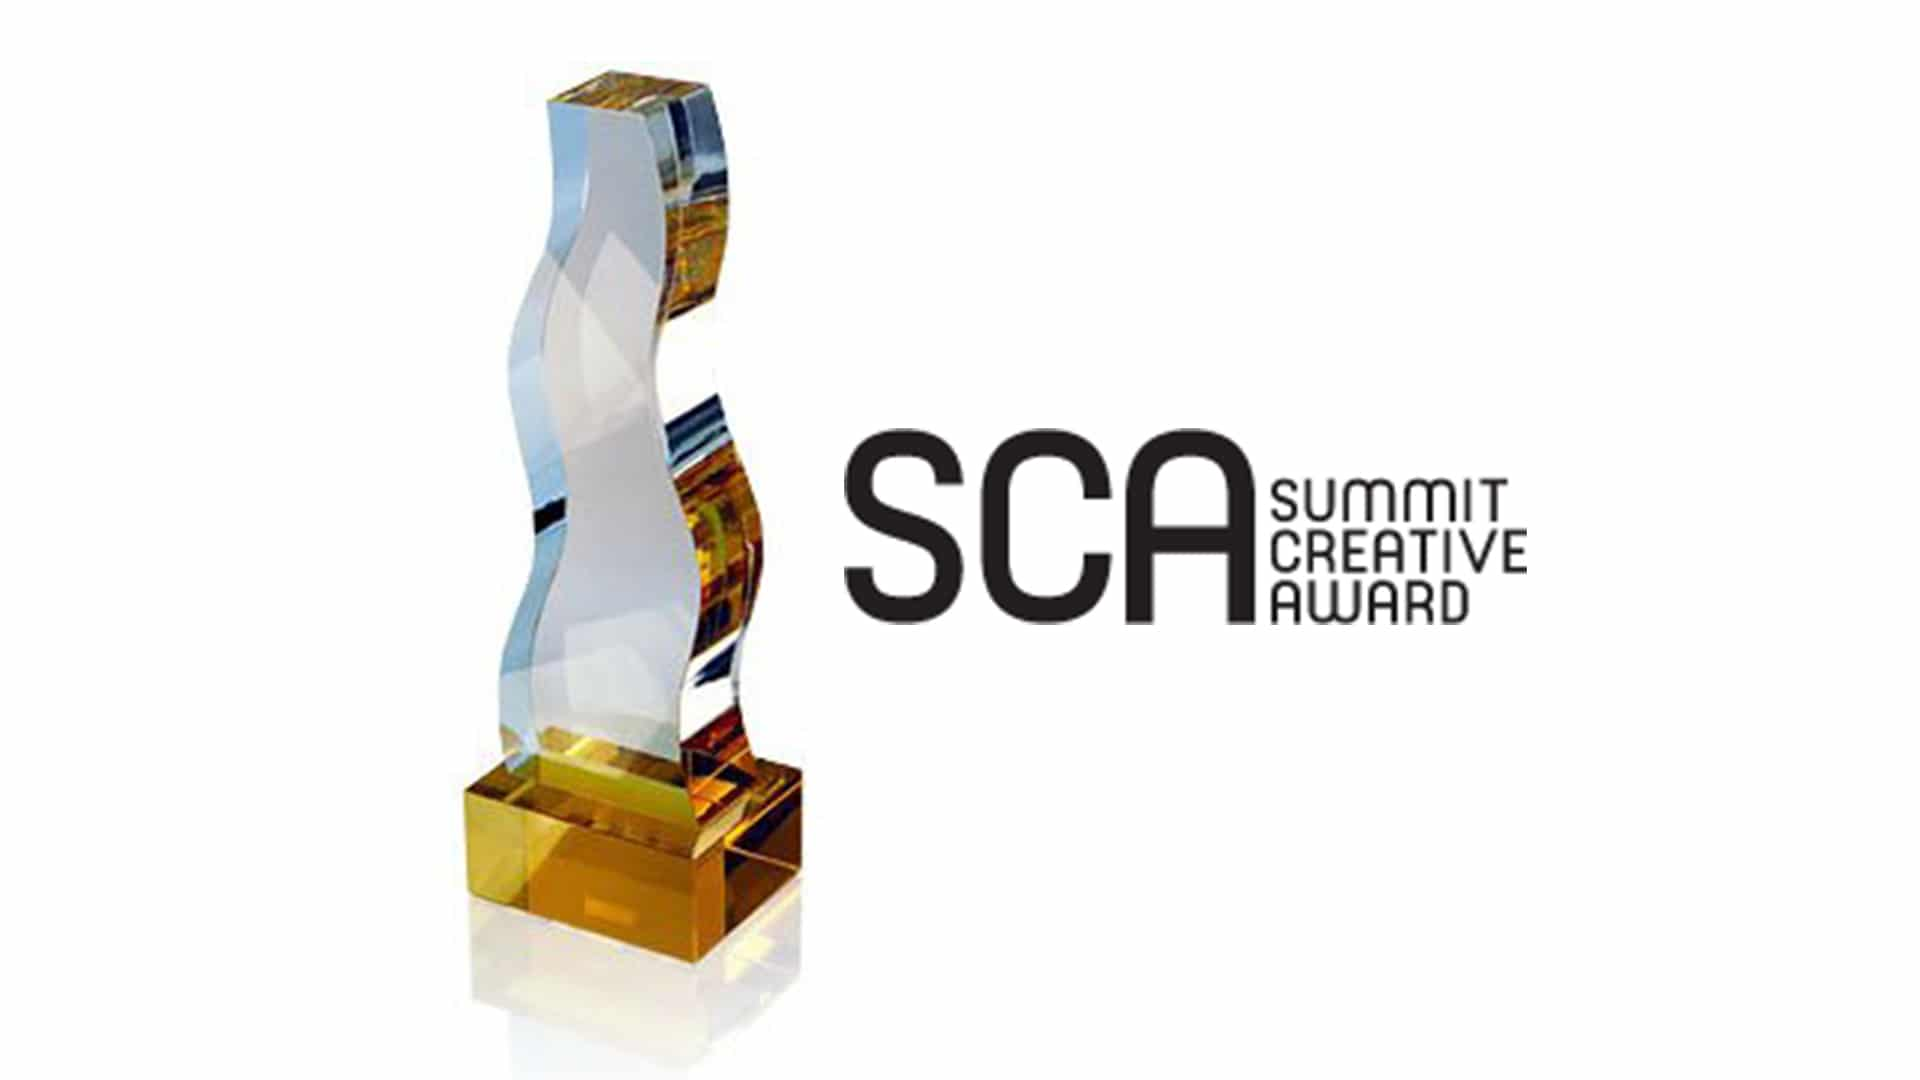 SCA Summit Creative Award